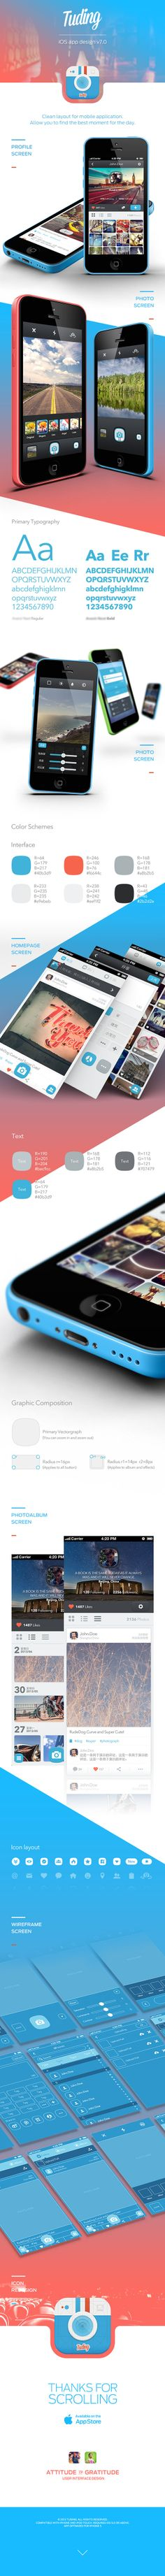 TUDING iOS App Design on Behance